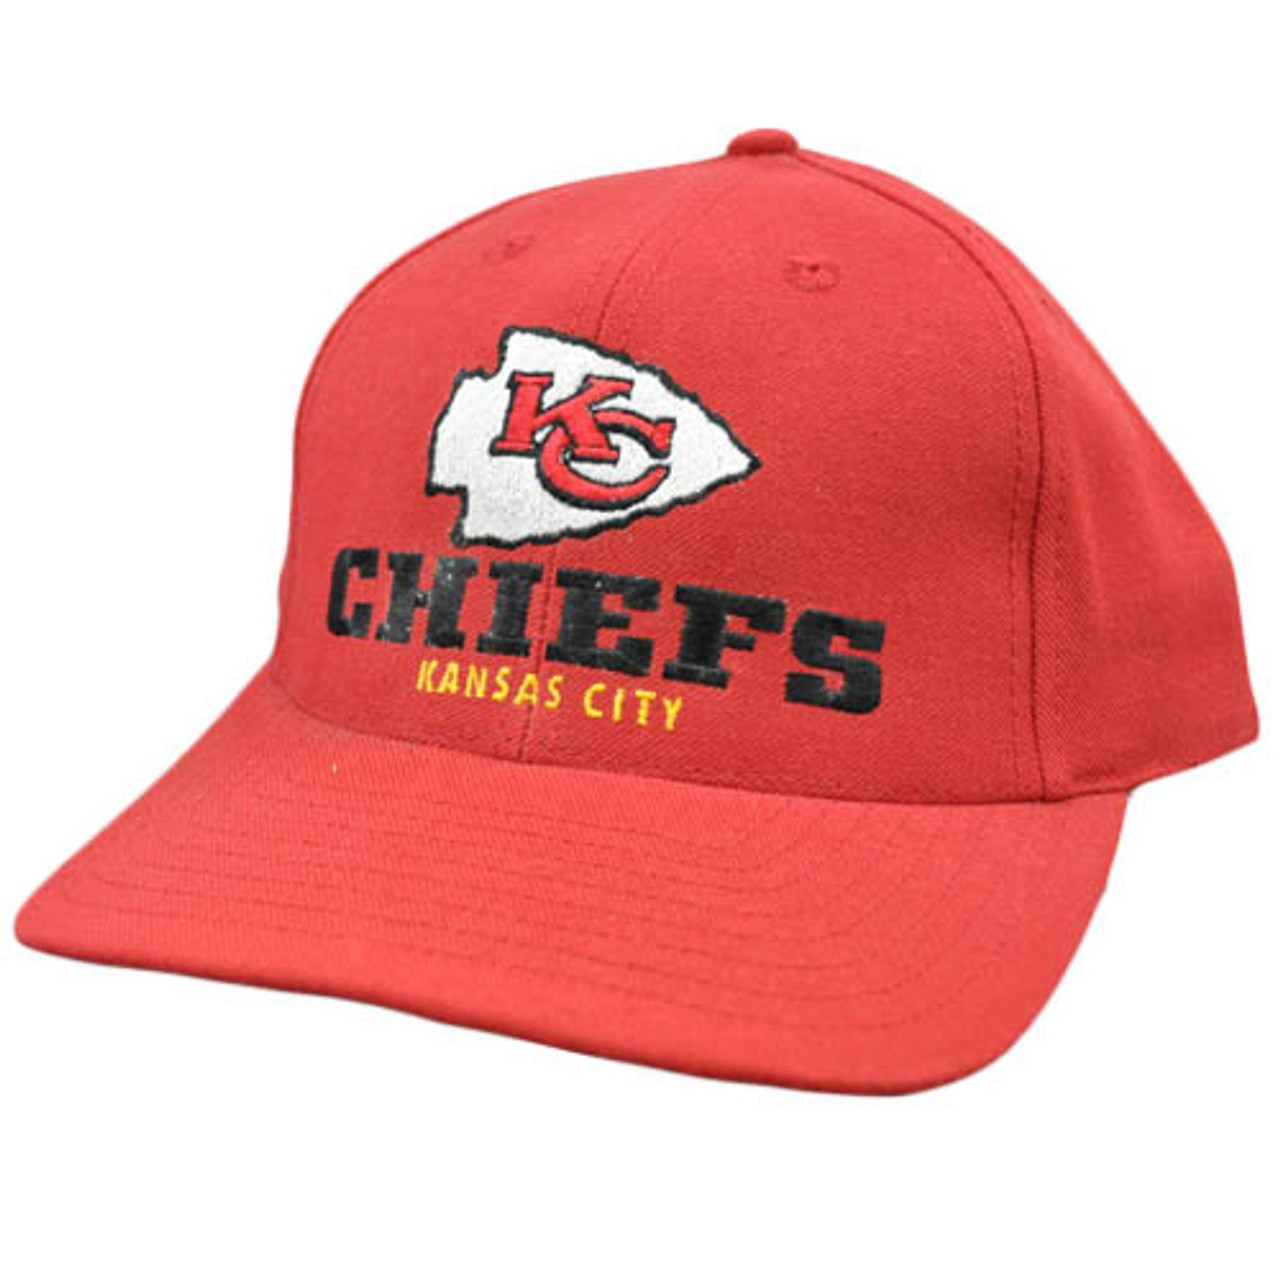 b6170204f23696 NFL Kansas City Chiefs Red Black Vintage Old School Flat Bill Snapback Hat  Cap - Cap Store Online.com